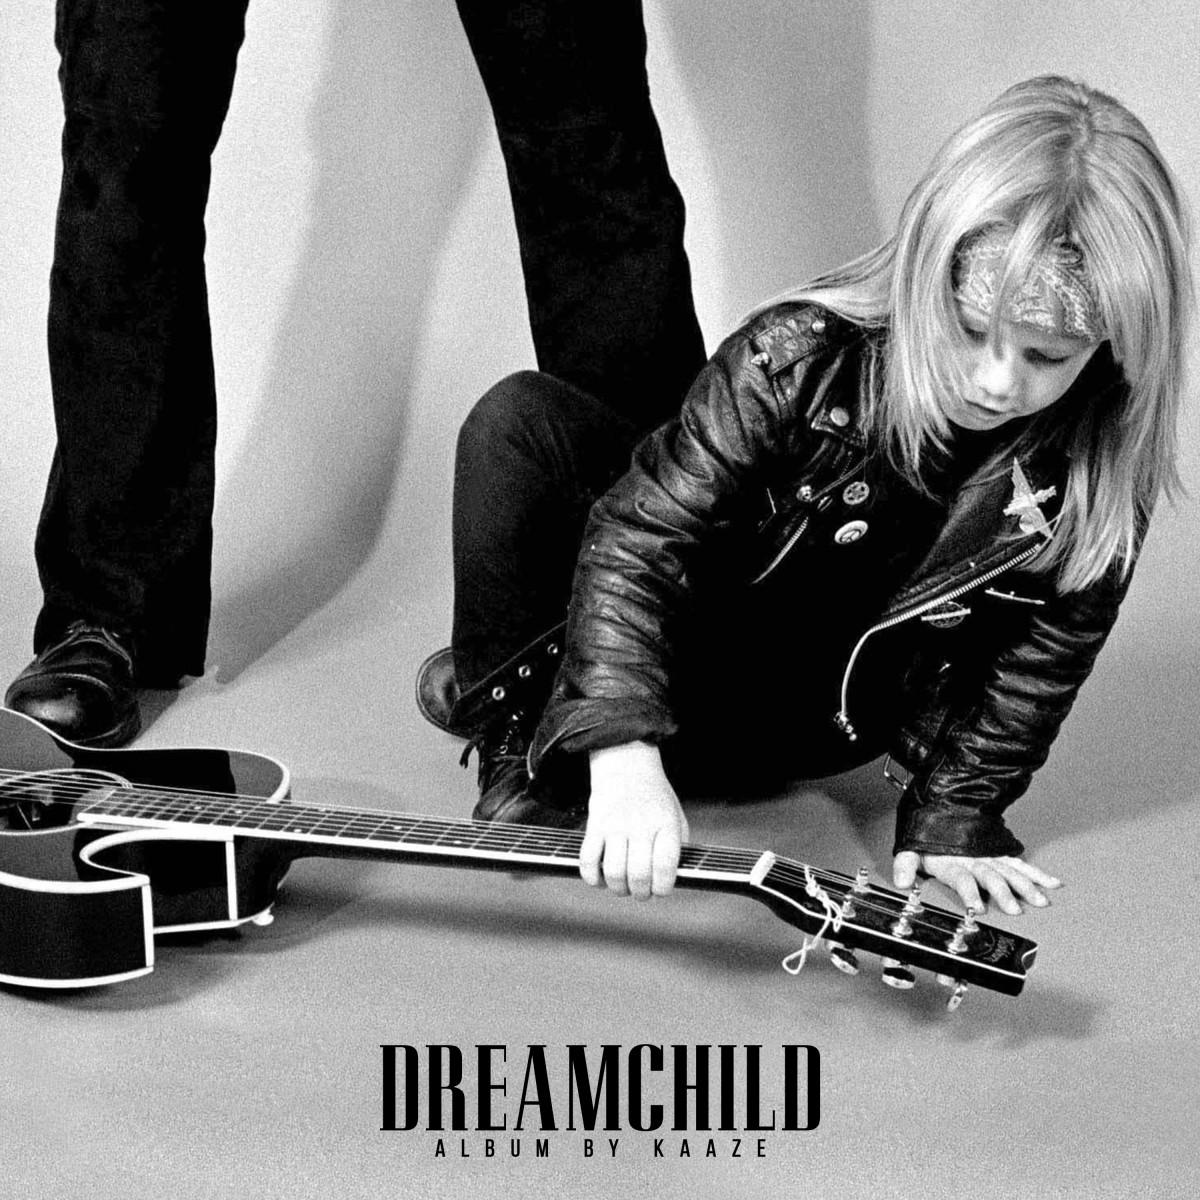 KAAZE - Dreamchild (Album Art) - Front Design [REVEALED RECORDINGS]